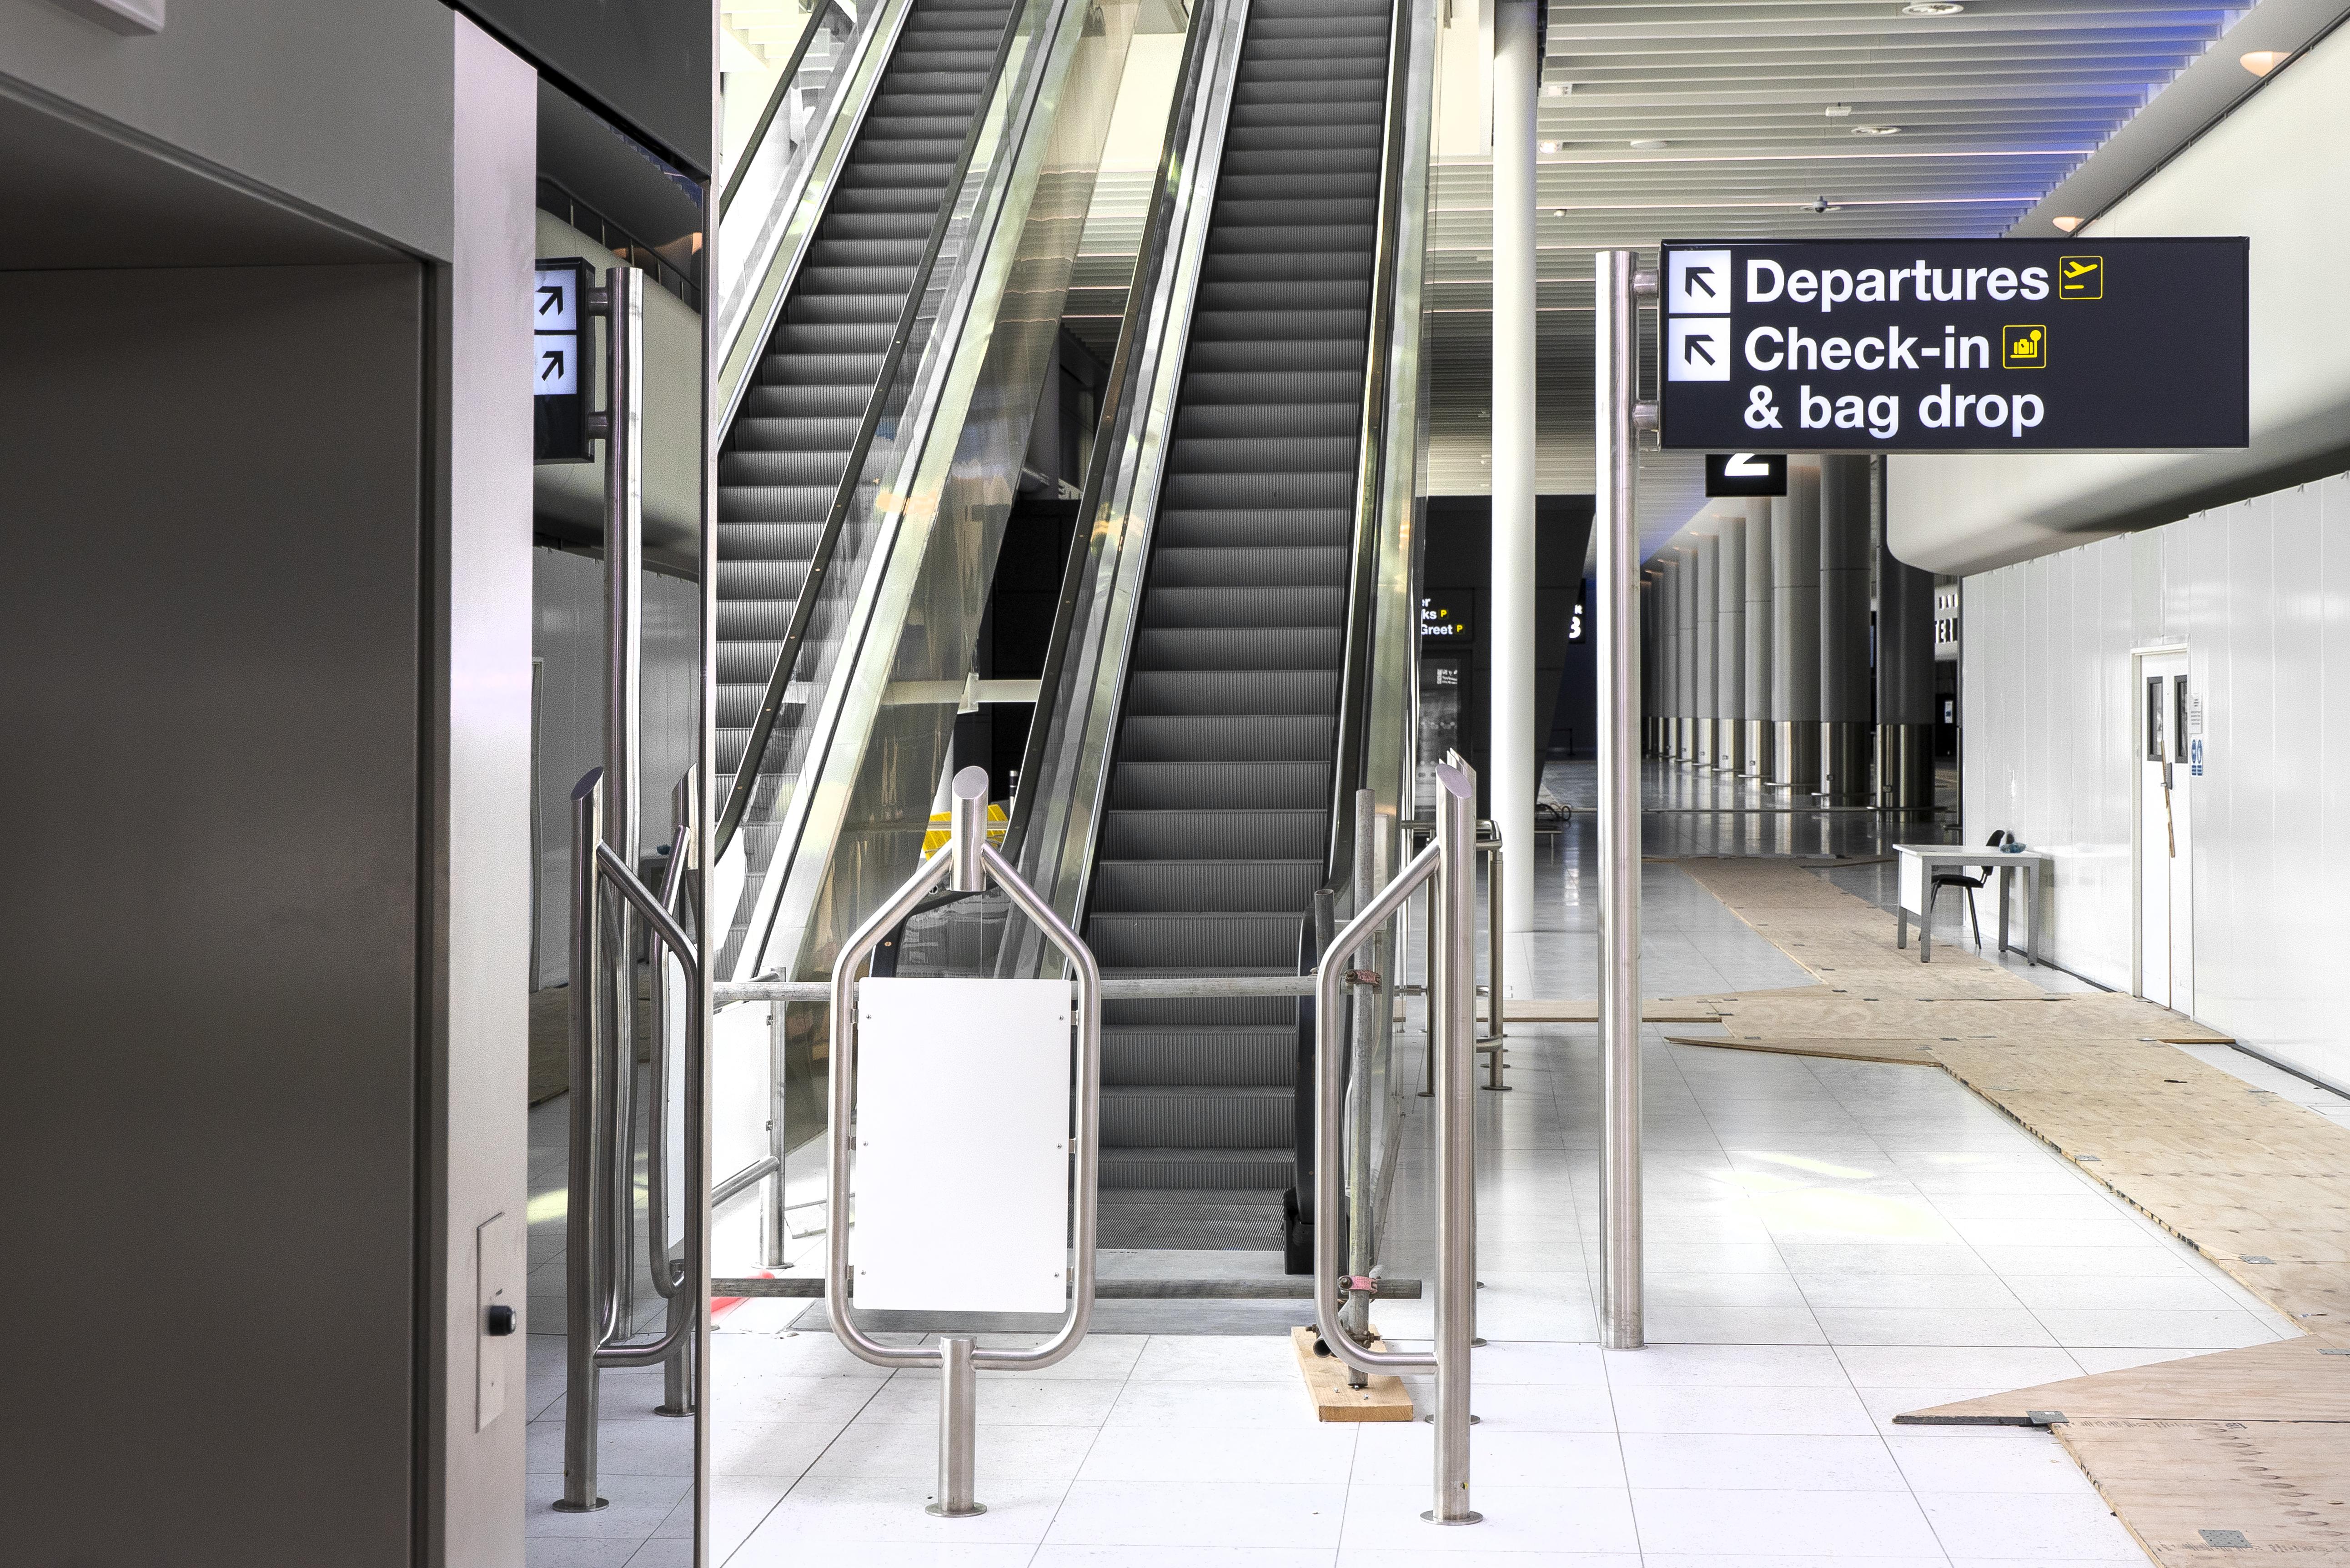 Manchester Airport Terminal 2